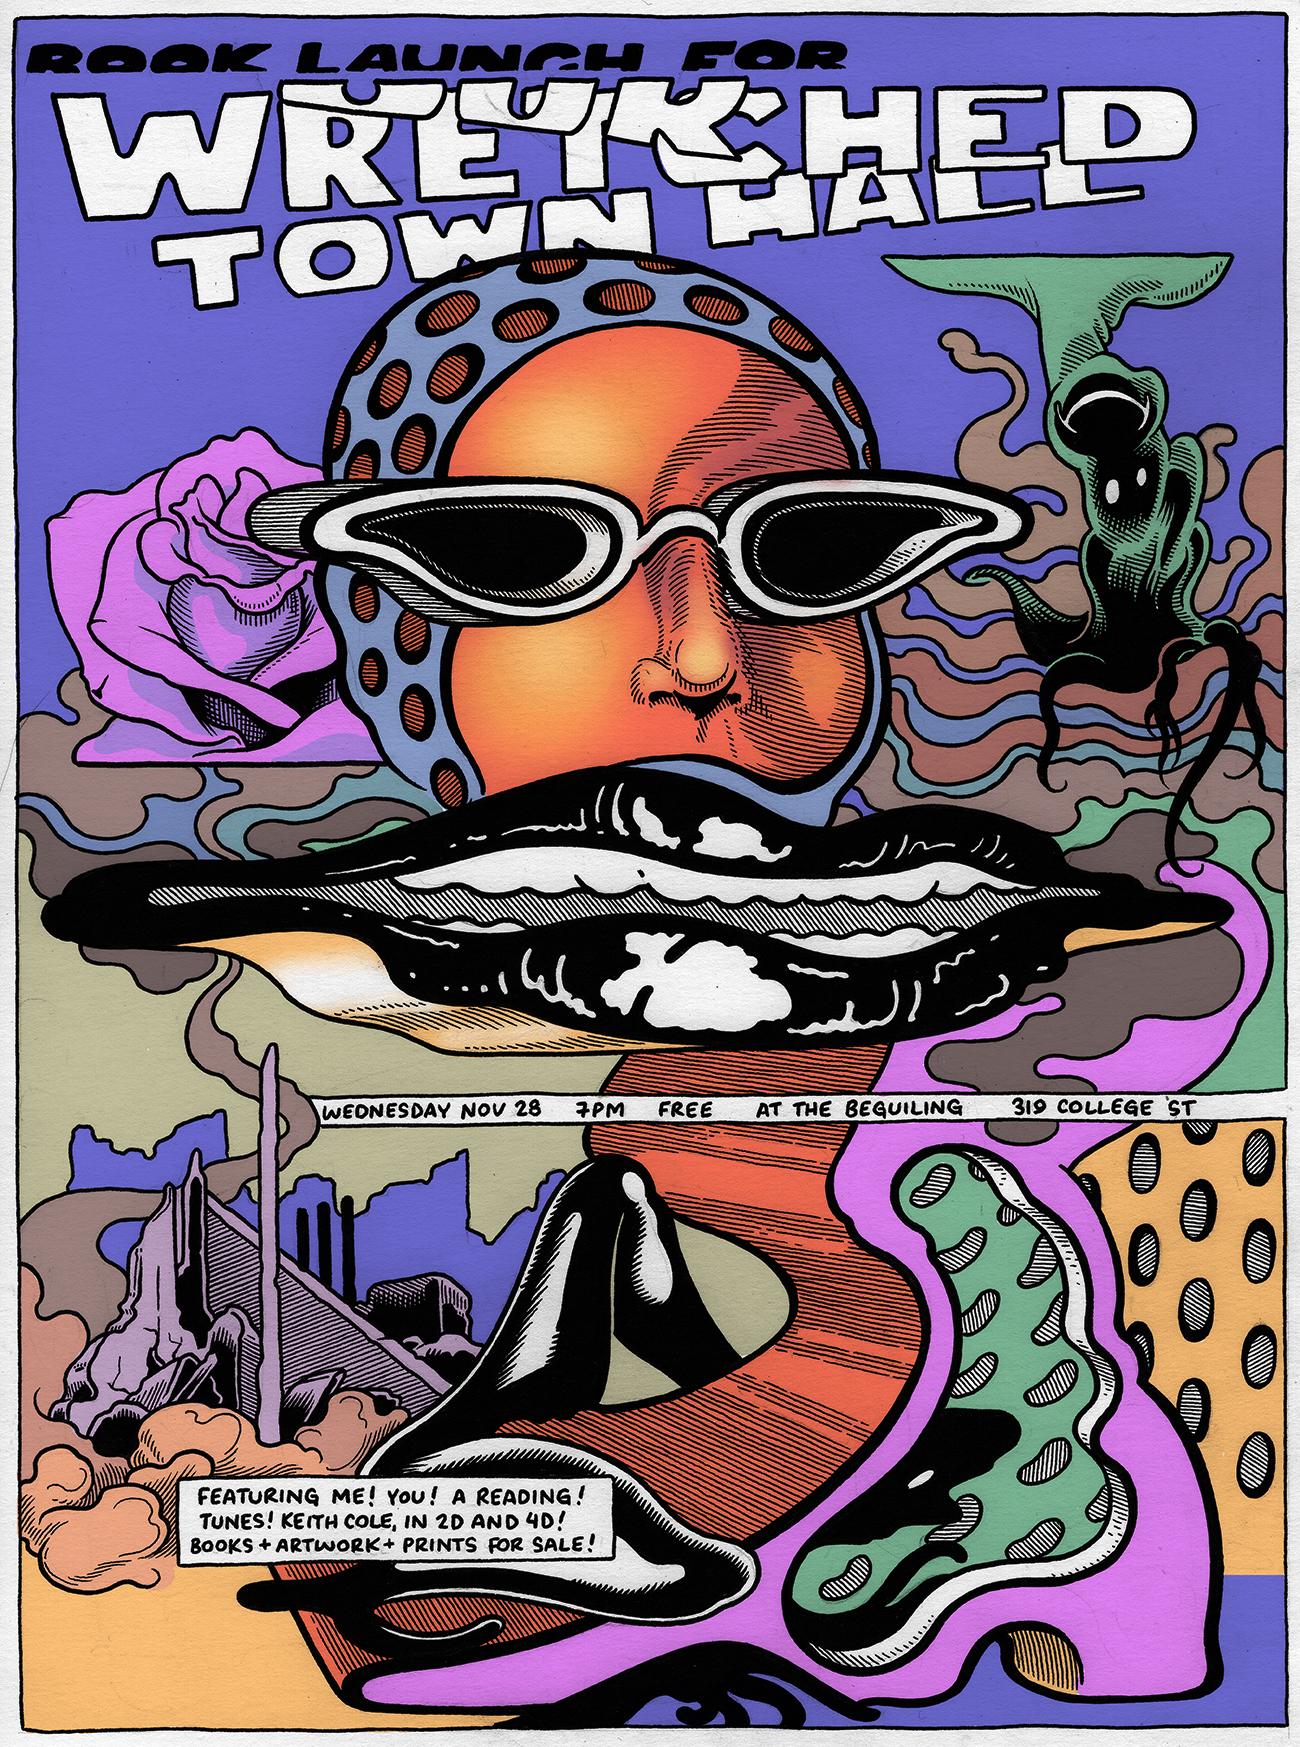 TownHallLaunch-web.jpg